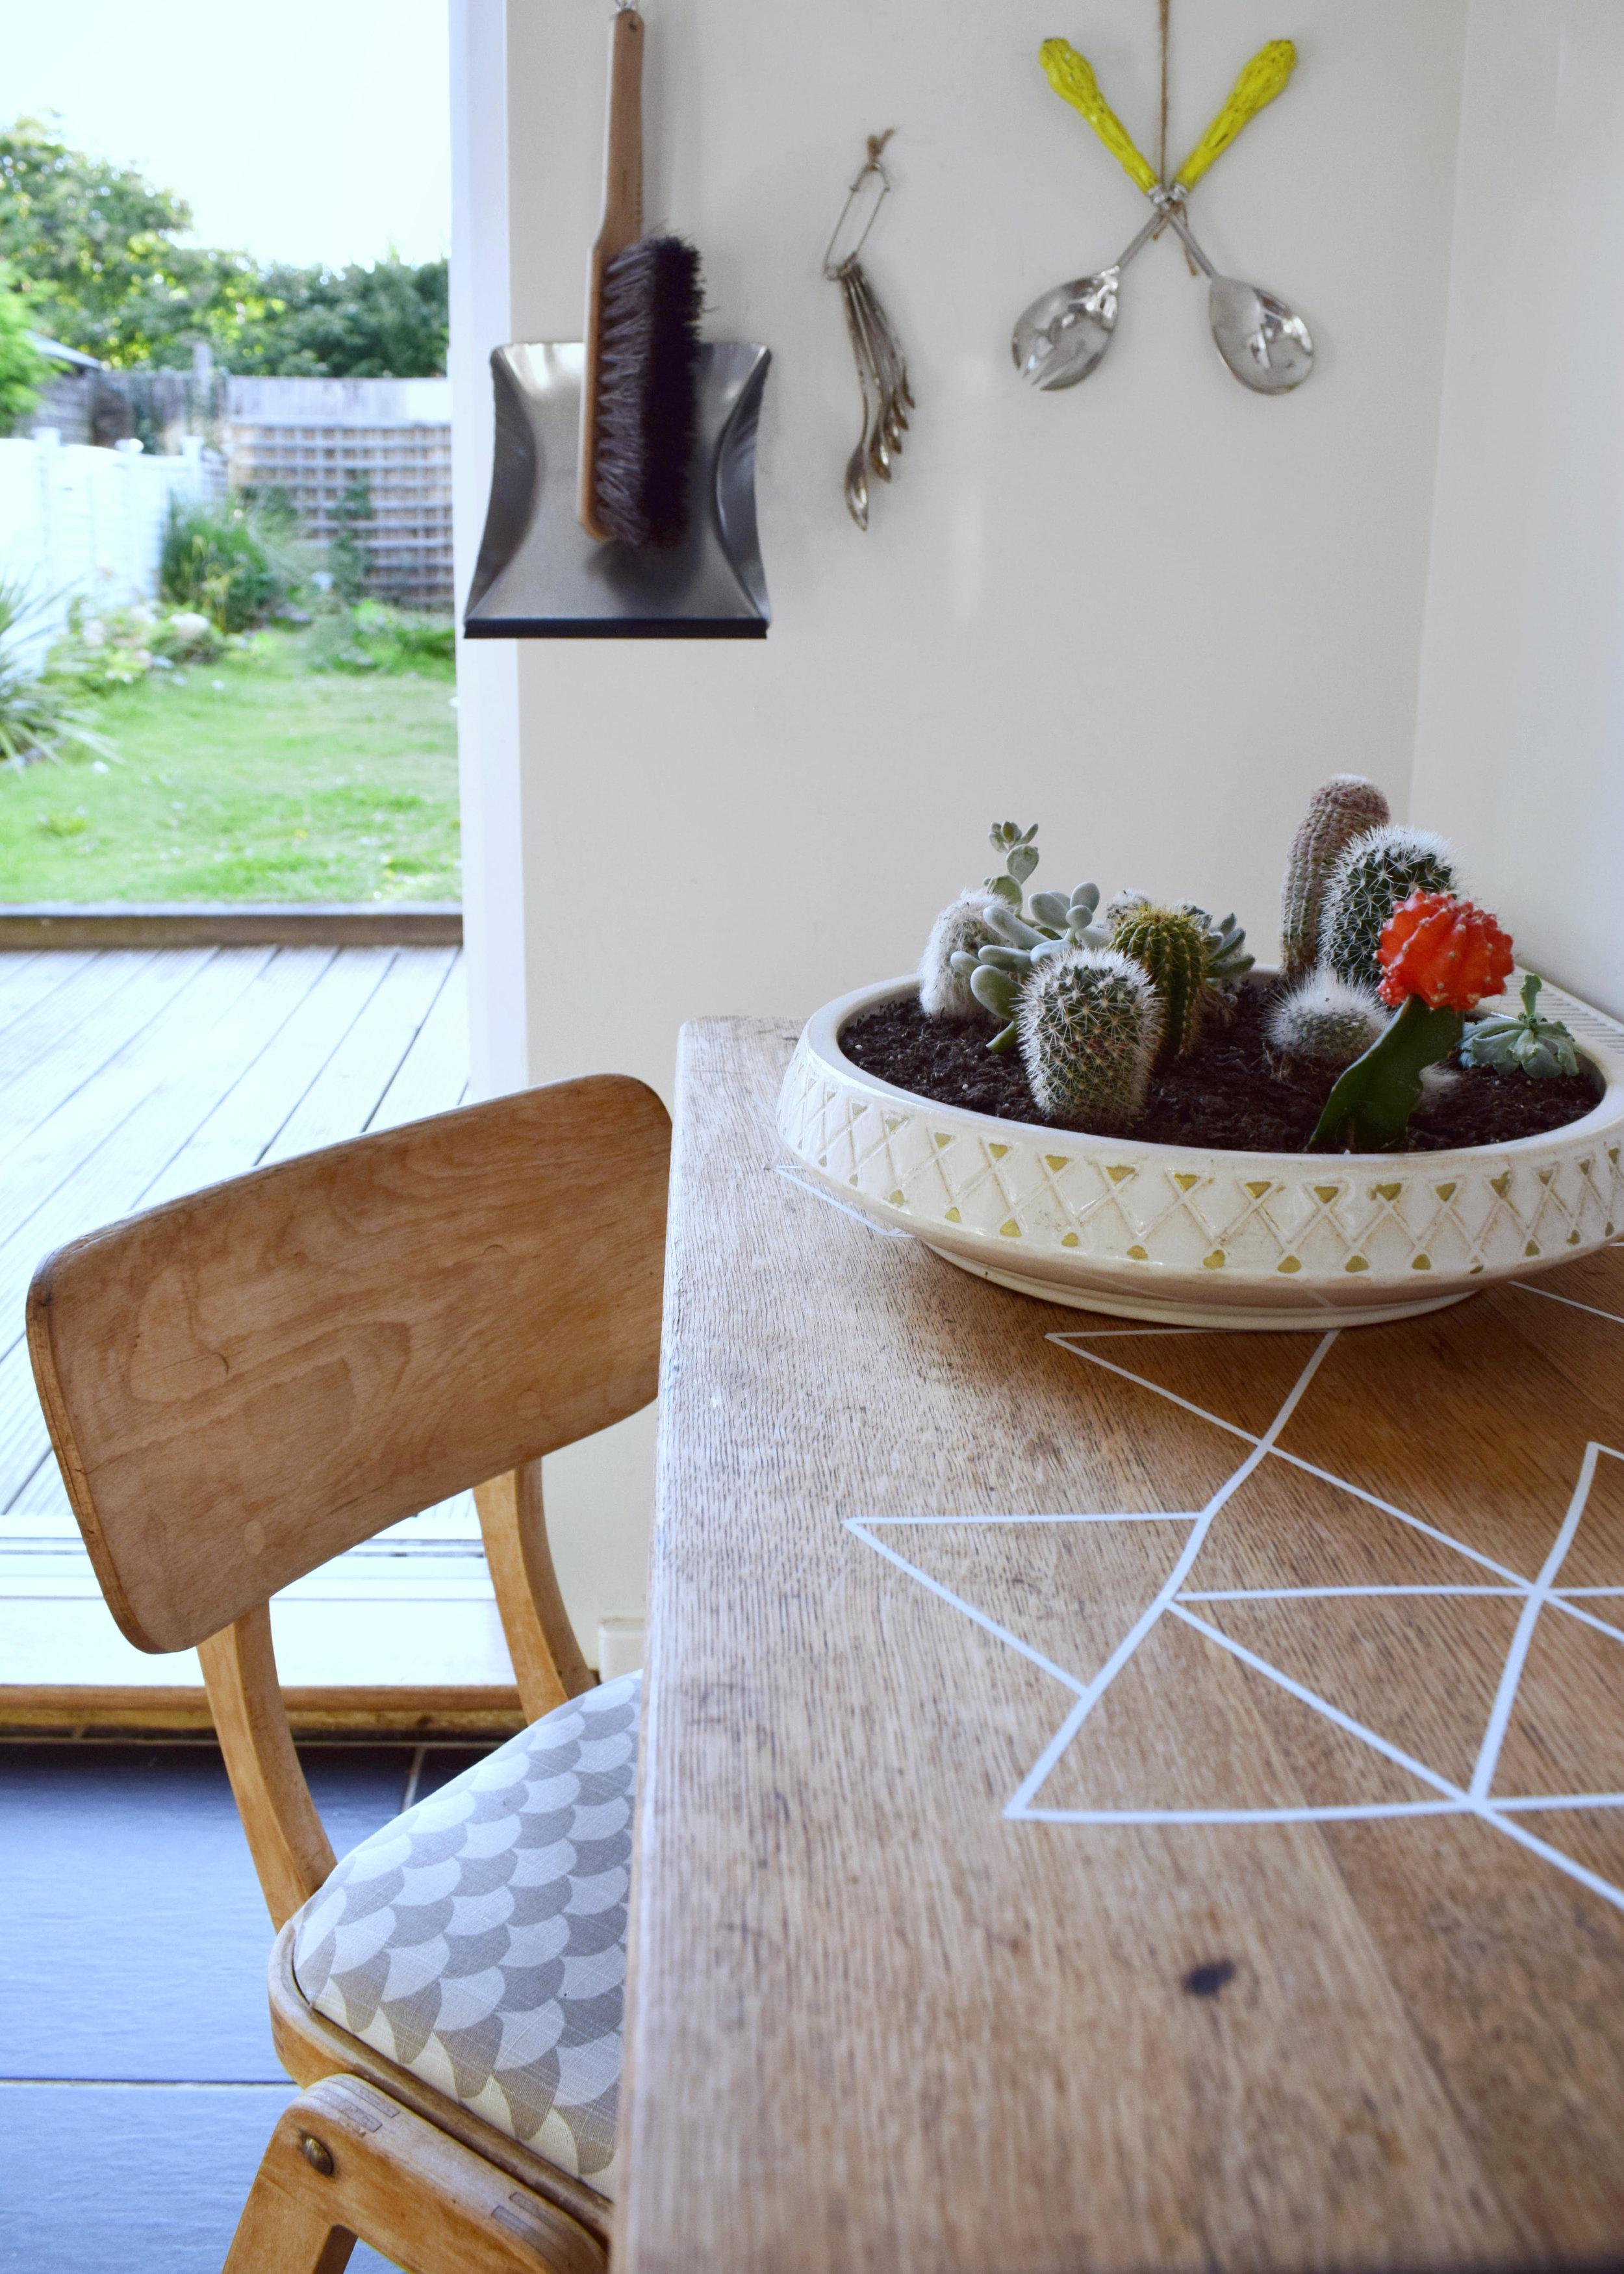 Kitchen Farrow ball slipper satin, vintage Scandinavian rustic budget kitchen refresh, artisan design and styling, monochrome colour base (2) copy.jpg